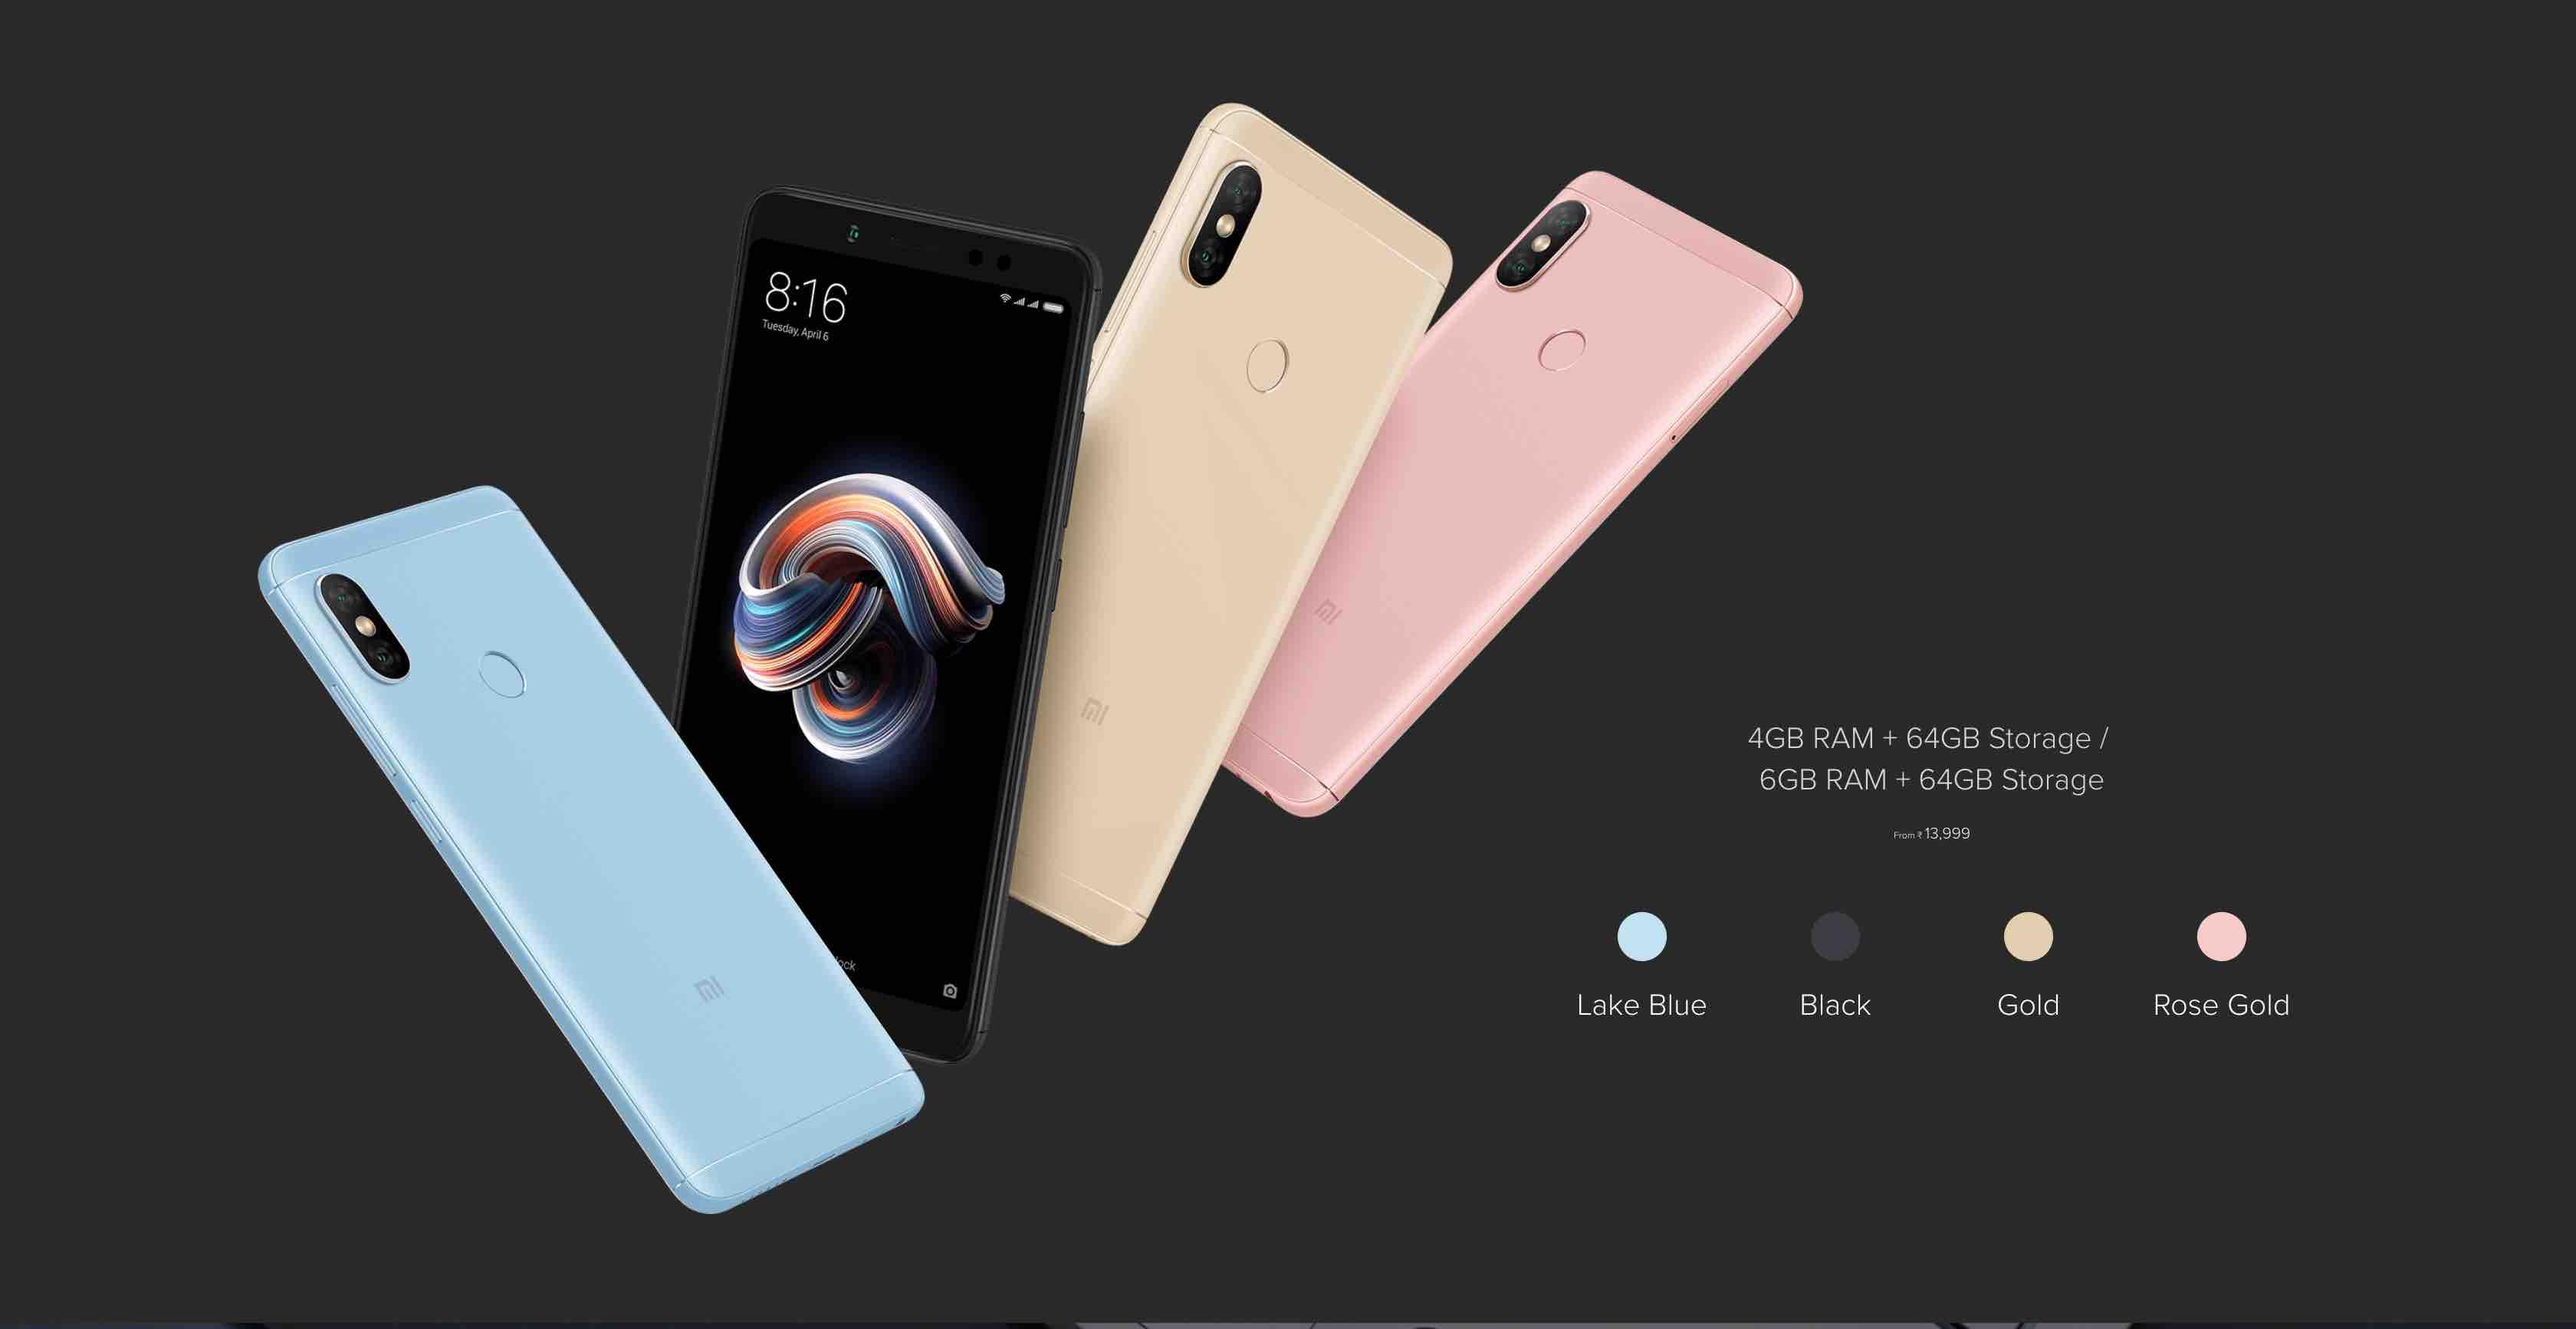 GearBest: Xiaomi Redmi Note 5 Pro